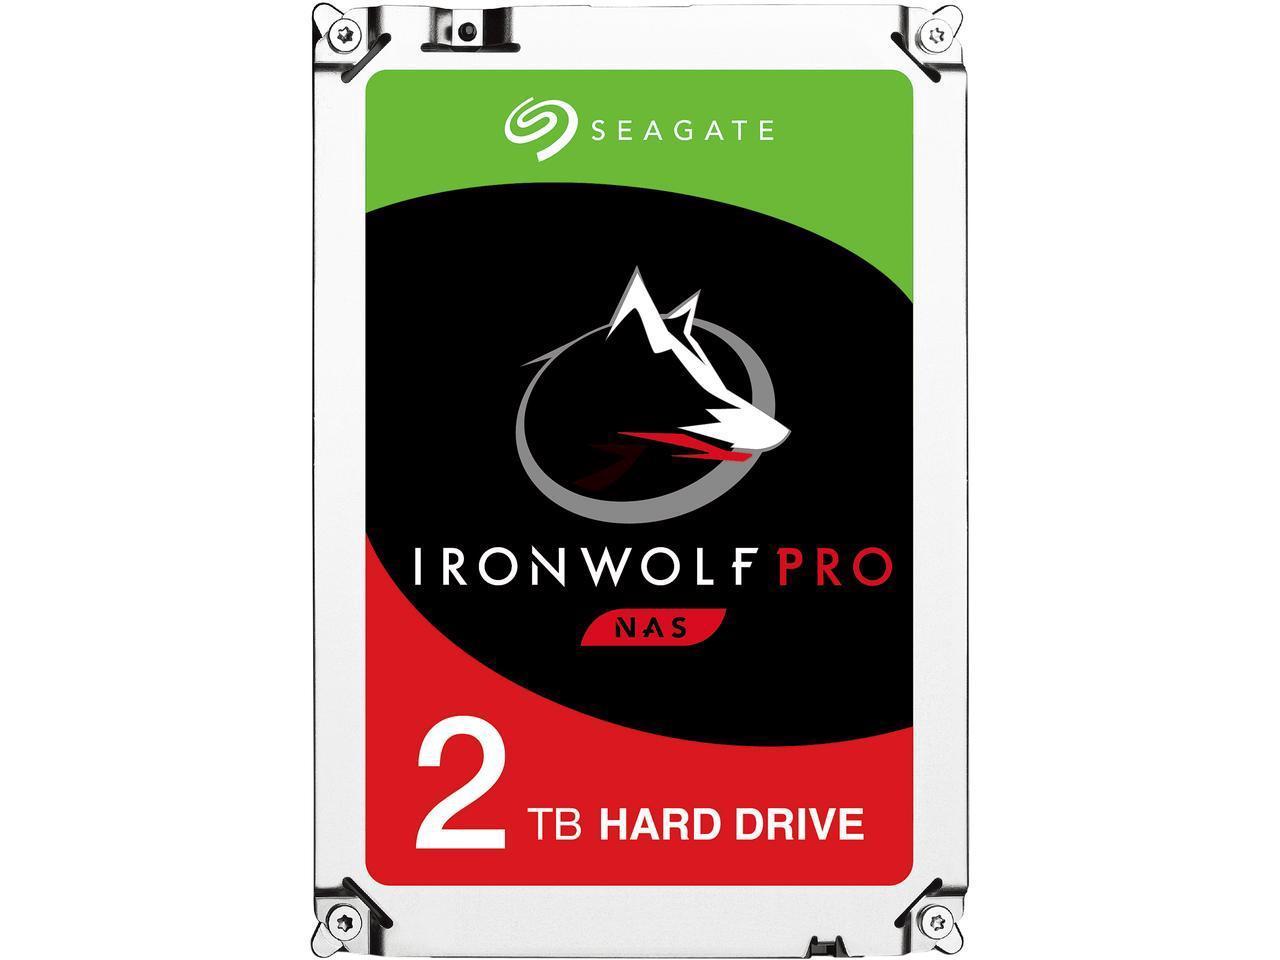 Seagate 2TB Internal IronWolf Pro SATA 3.5 Hard Drive